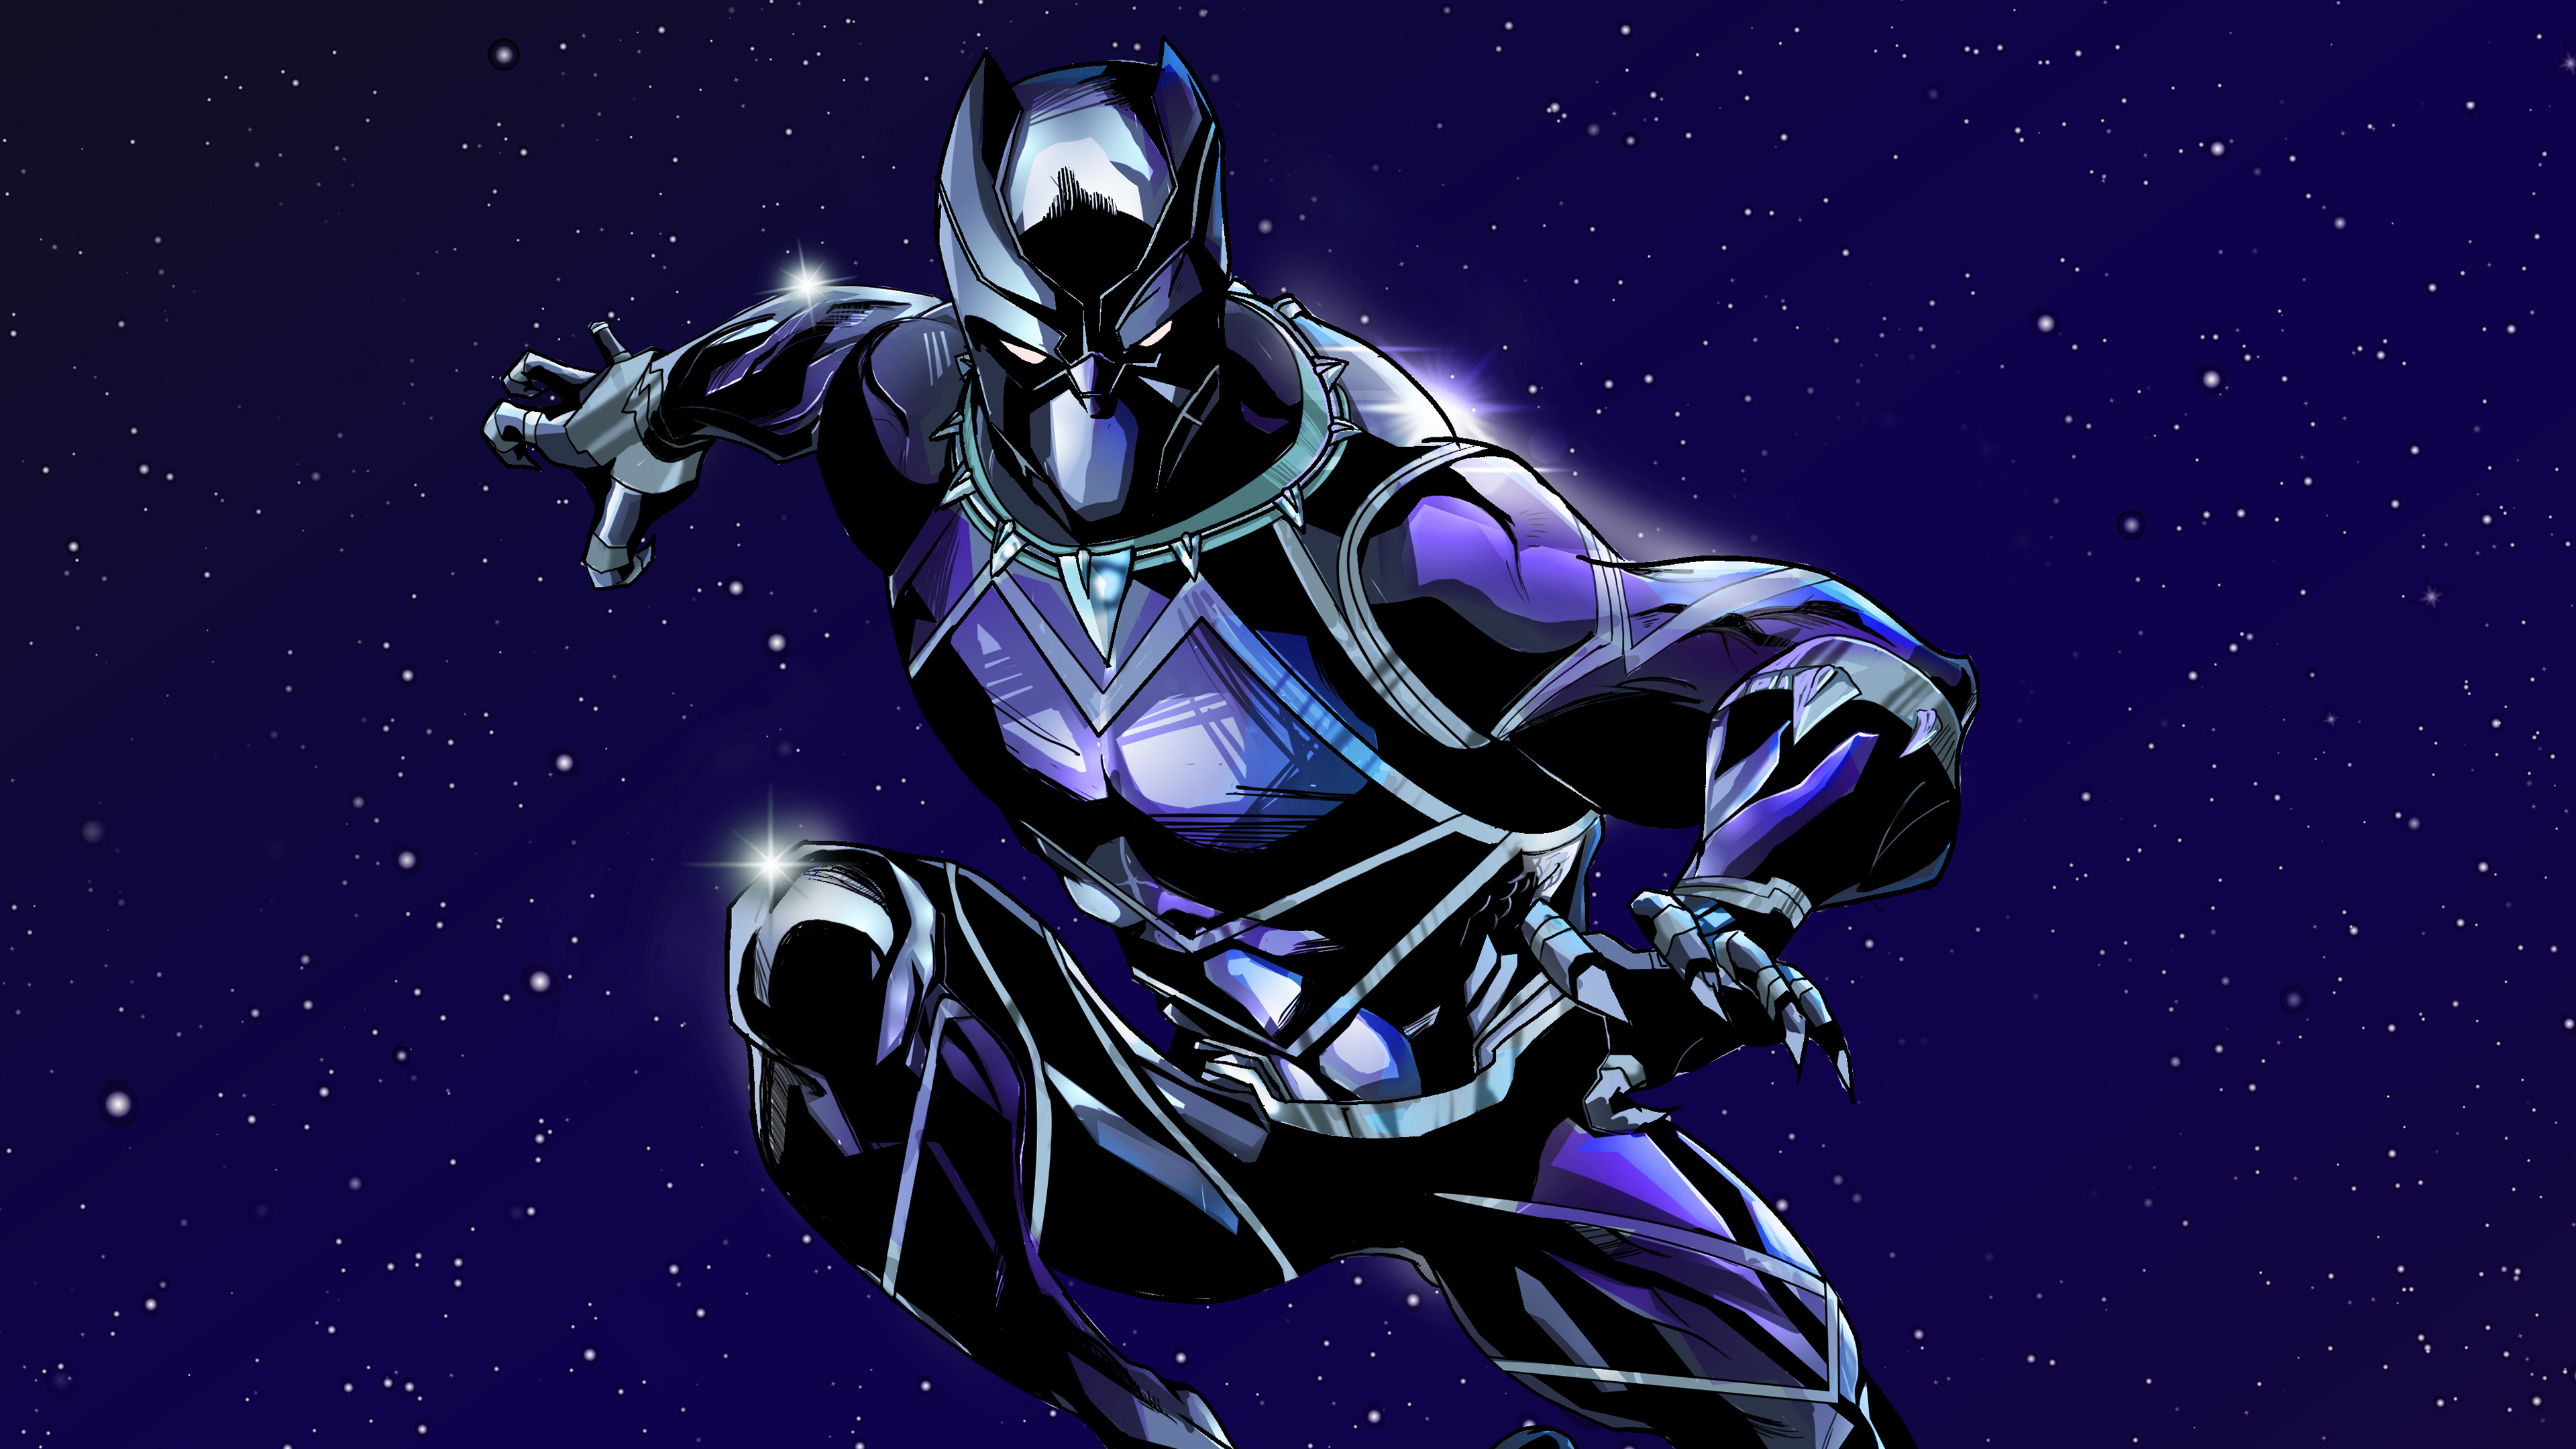 Beautiful Black Panther 4k Ultra Hd Wallpaper Download Wallpaper